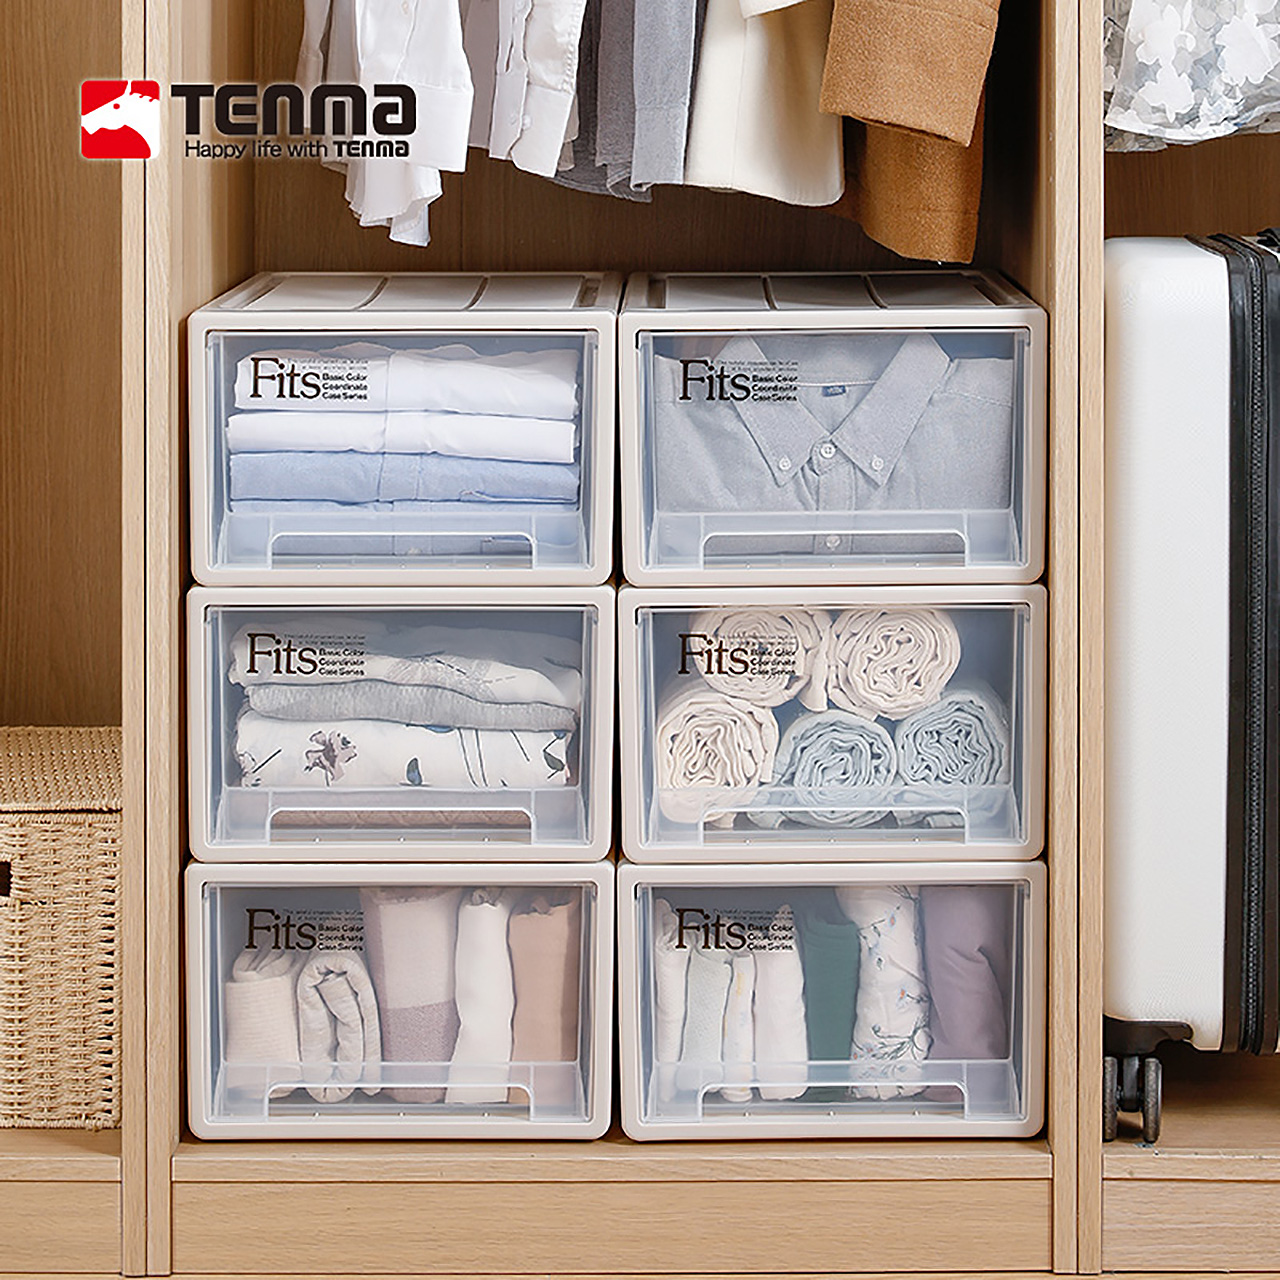 (Via recommended) tenma Japan Tianma Co. Ltd. drawer-type storage box plastic finishing box 3 packs